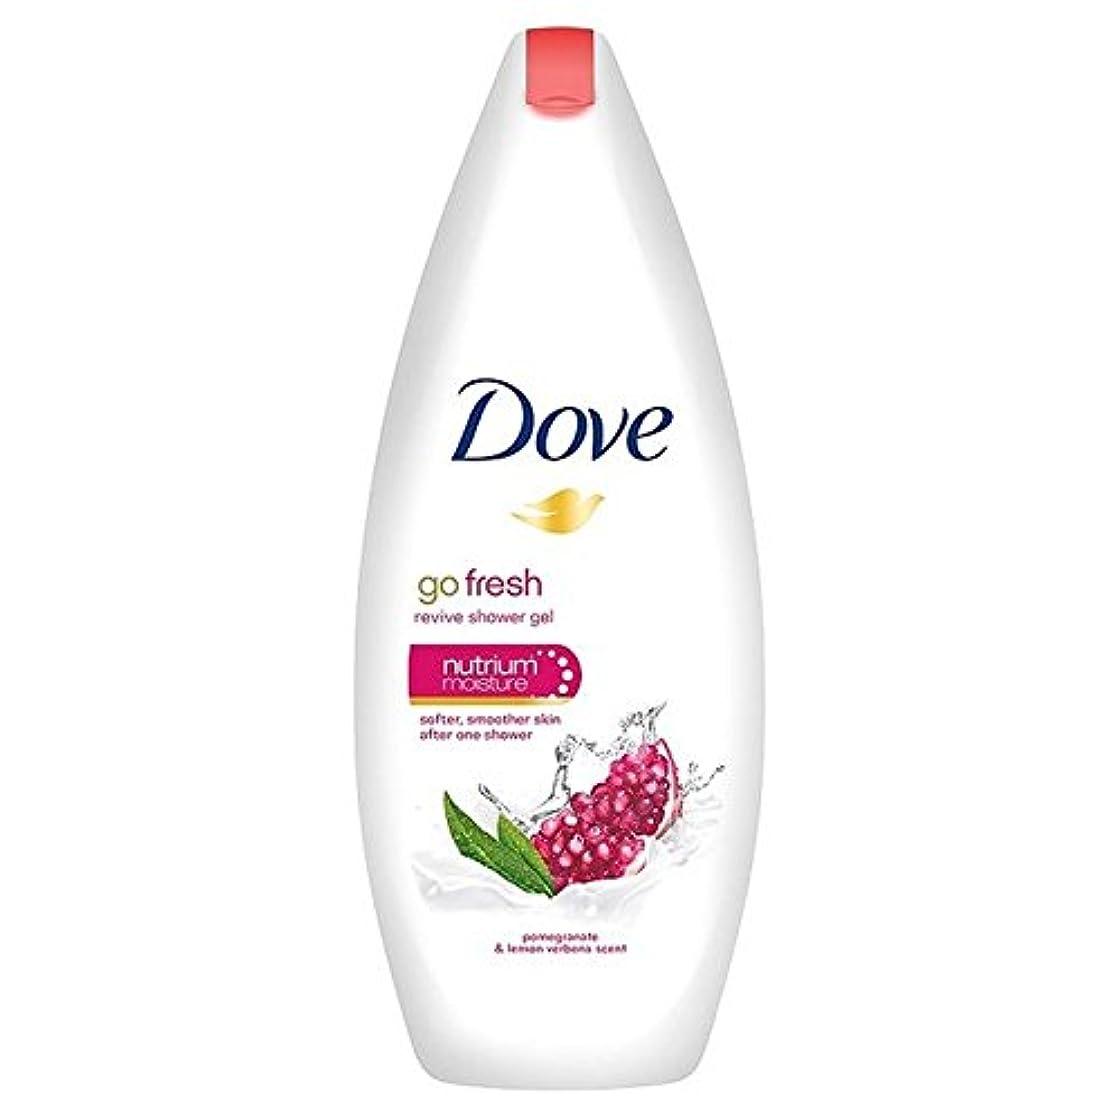 Dove Go Fresh Pomegranate Body Wash 250ml - 鳩は、新鮮なザクロボディウォッシュ250ミリリットルを行きます [並行輸入品]